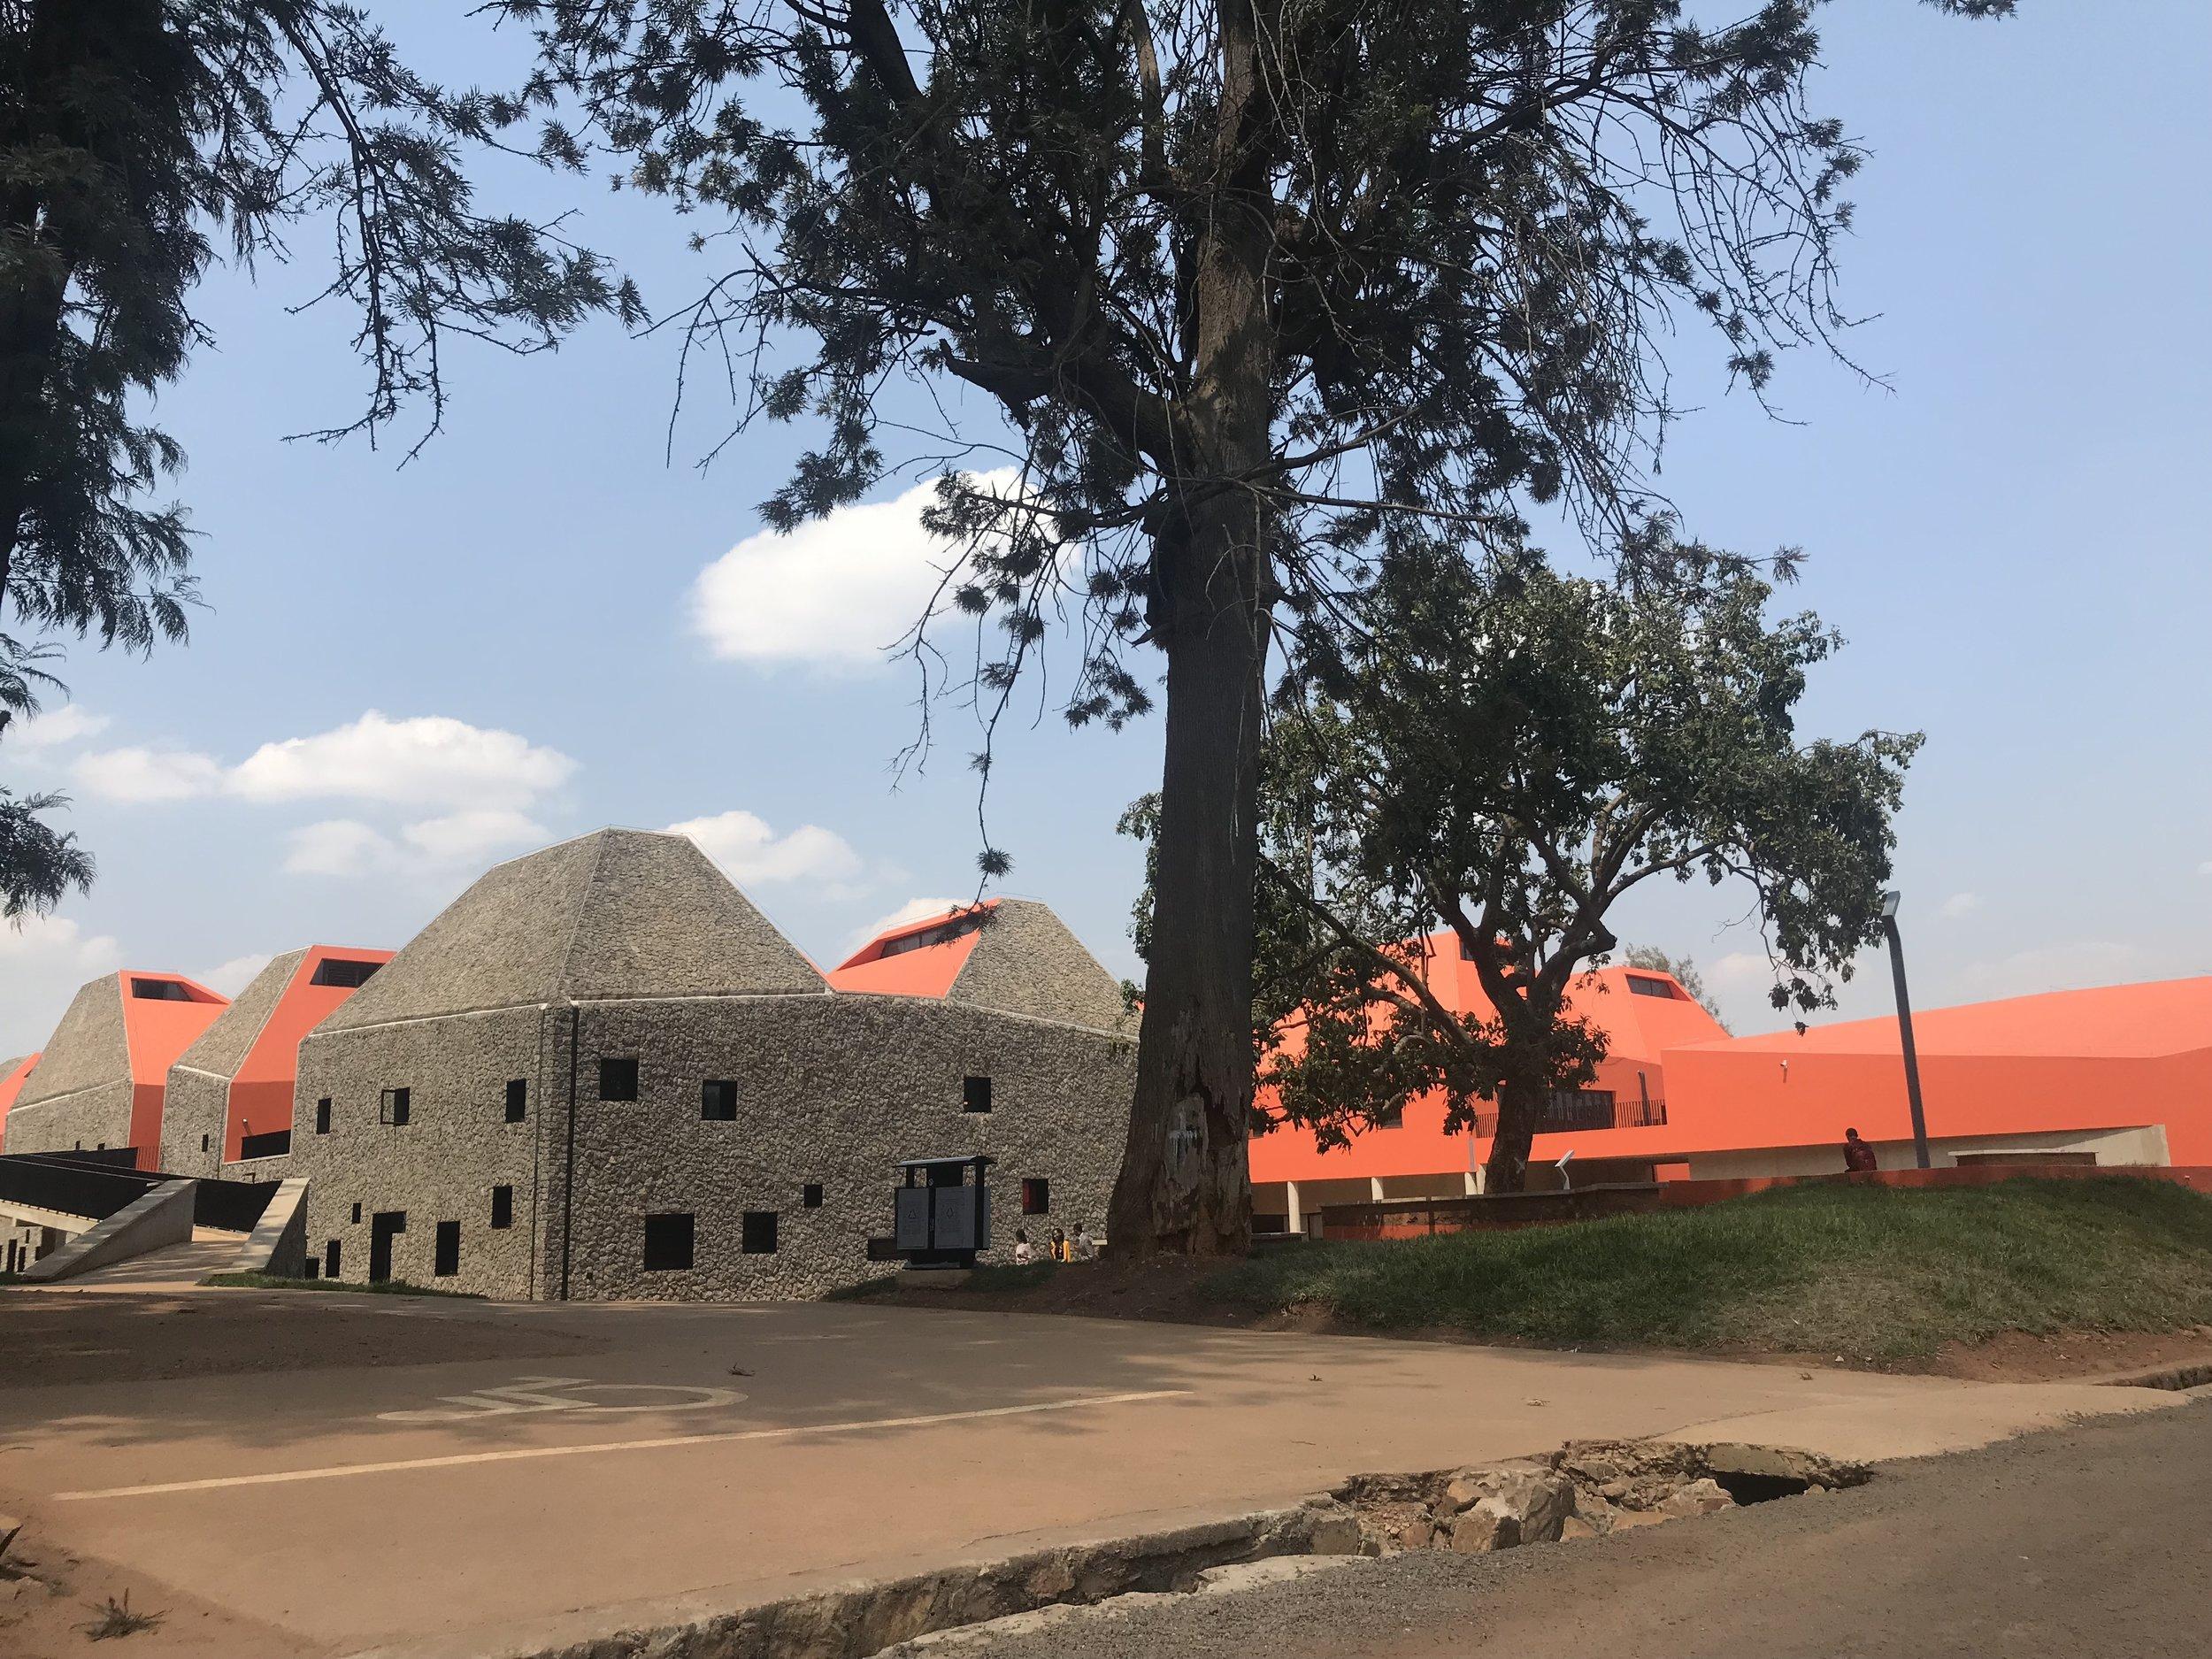 IMG_6018 2VickieRemoe-travel-kigali-rwanda-review-kwibohora25-hotels-africa.JPG